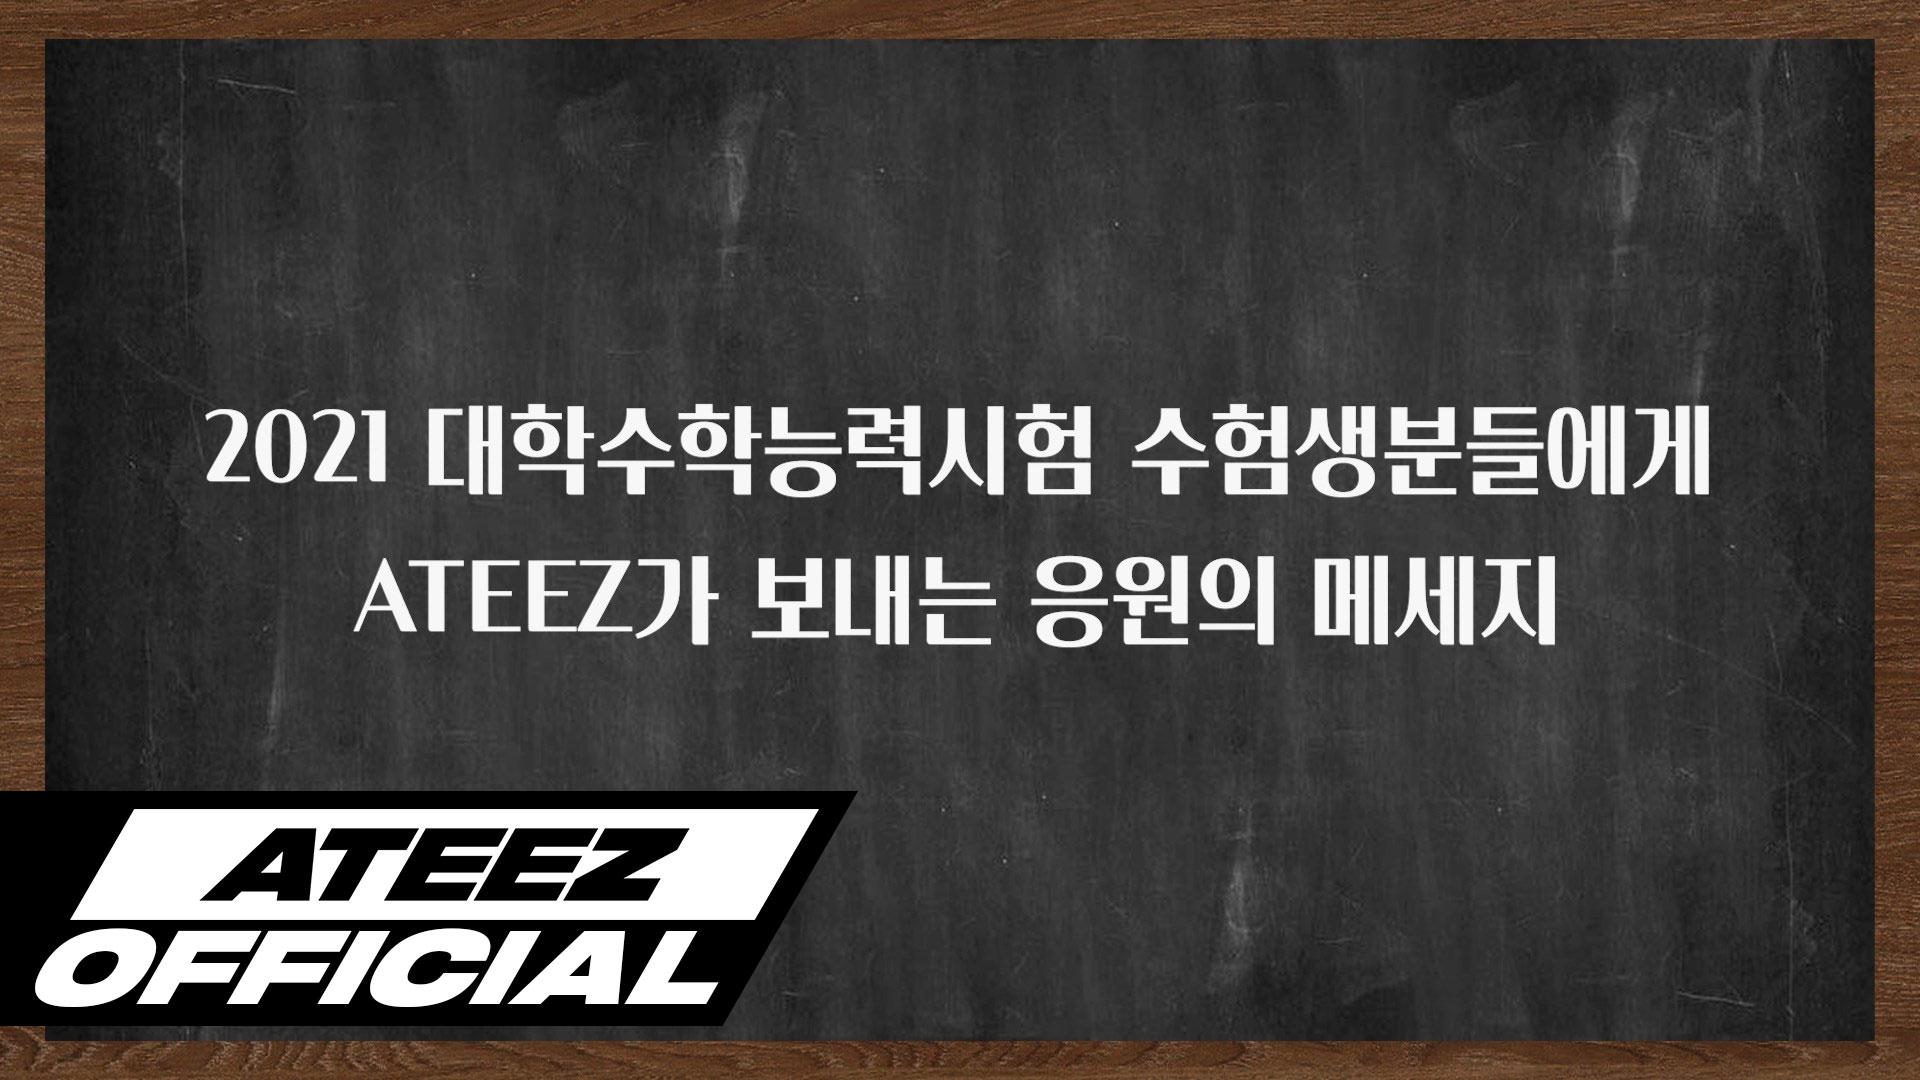 ATEEZ(에이티즈) 2021 수능 응원 영상